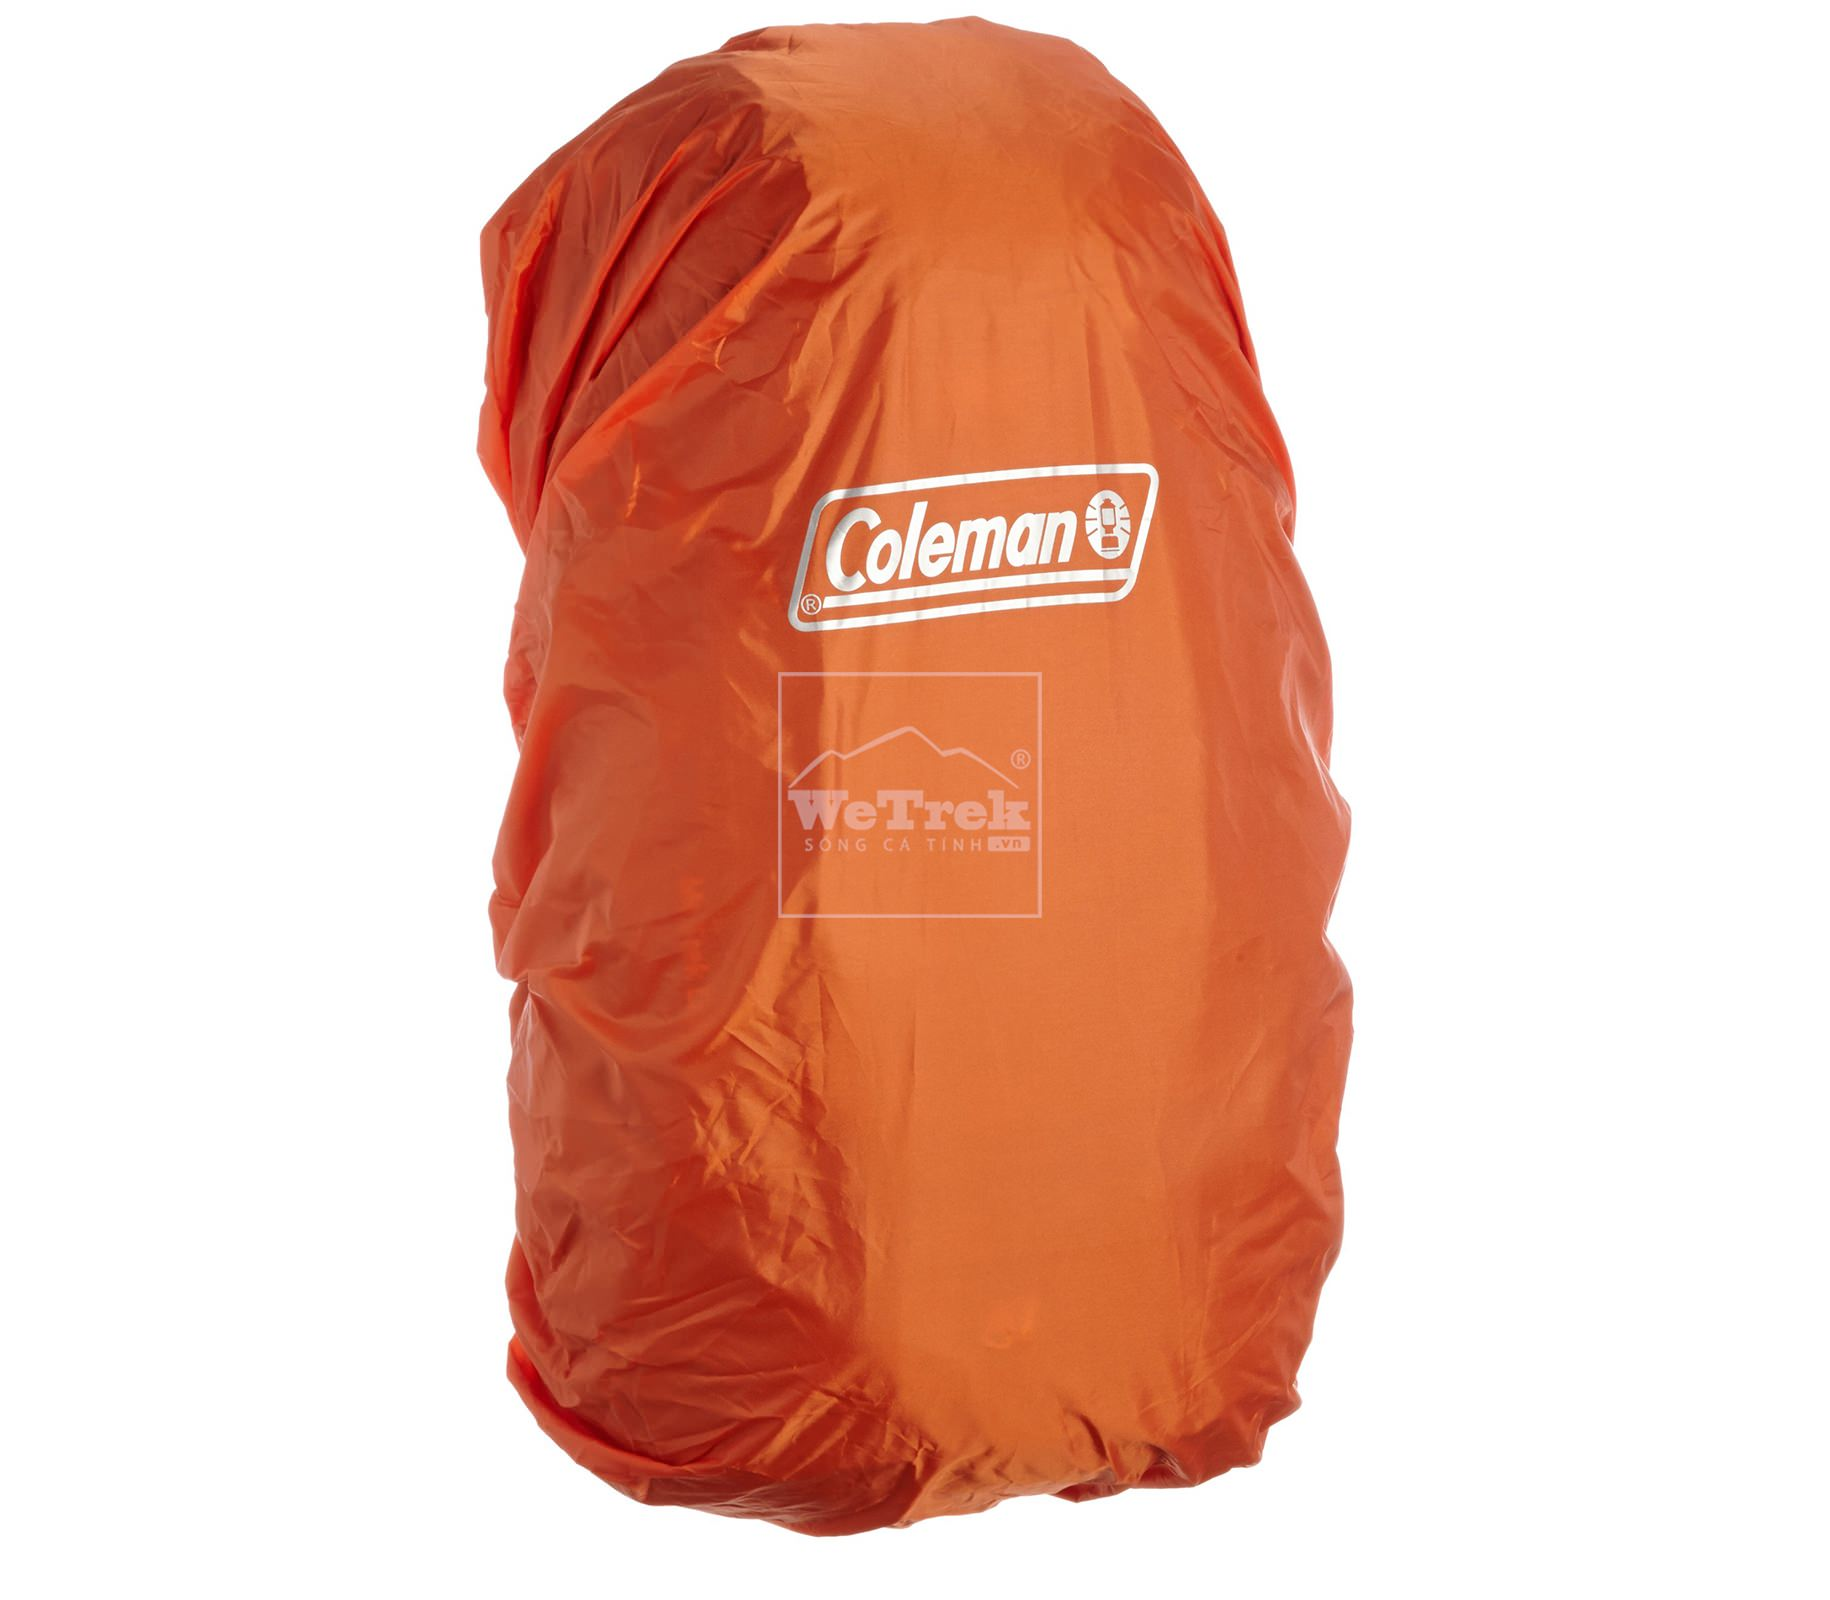 ba-lo-leo-nui-40l-coleman-mttrek-lite-backpack-red-cbb4091rd-7456-wetrek.vn-3